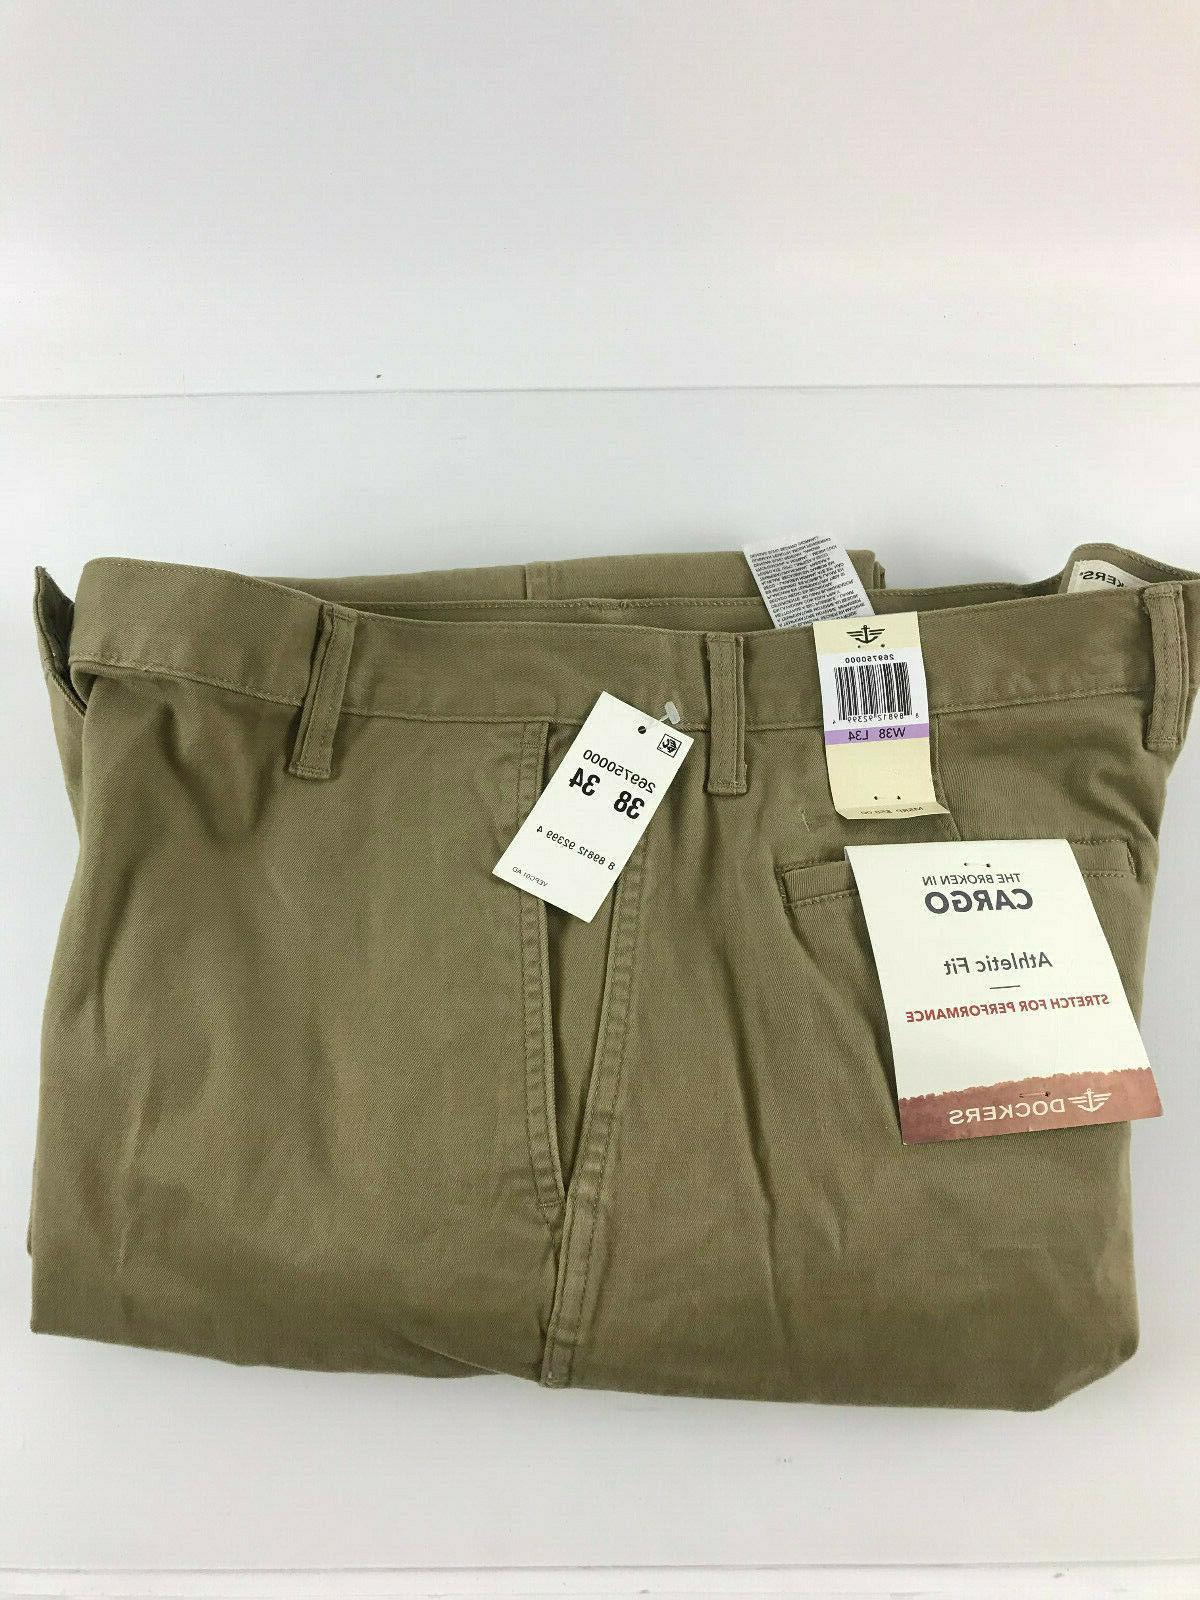 cargo pants khakis 38x34 athletic fit